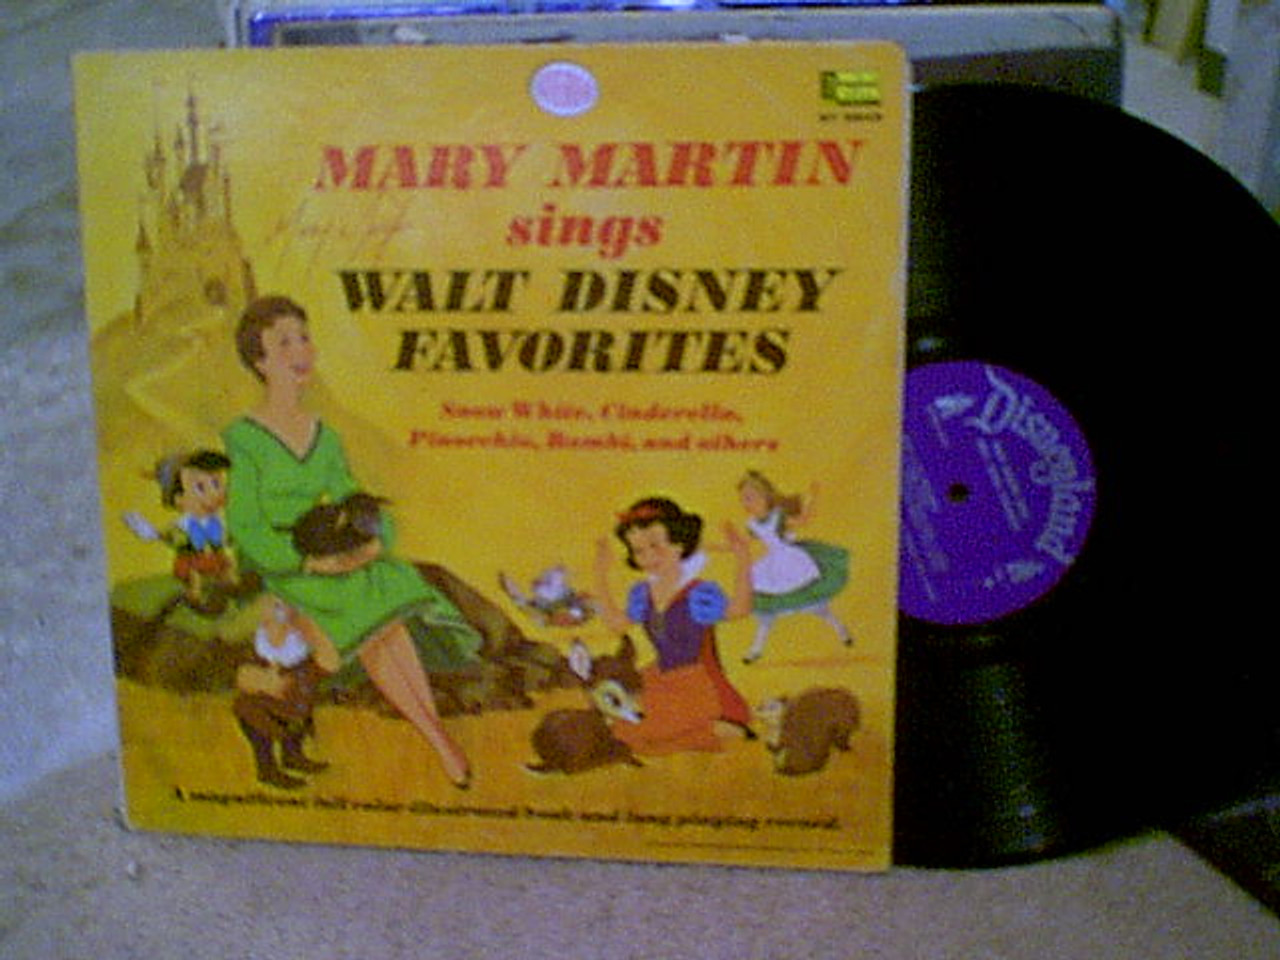 Martin, Mary LP Signed Autograph Walt Disney Favorites Snow White Cinderella Bambi 1966